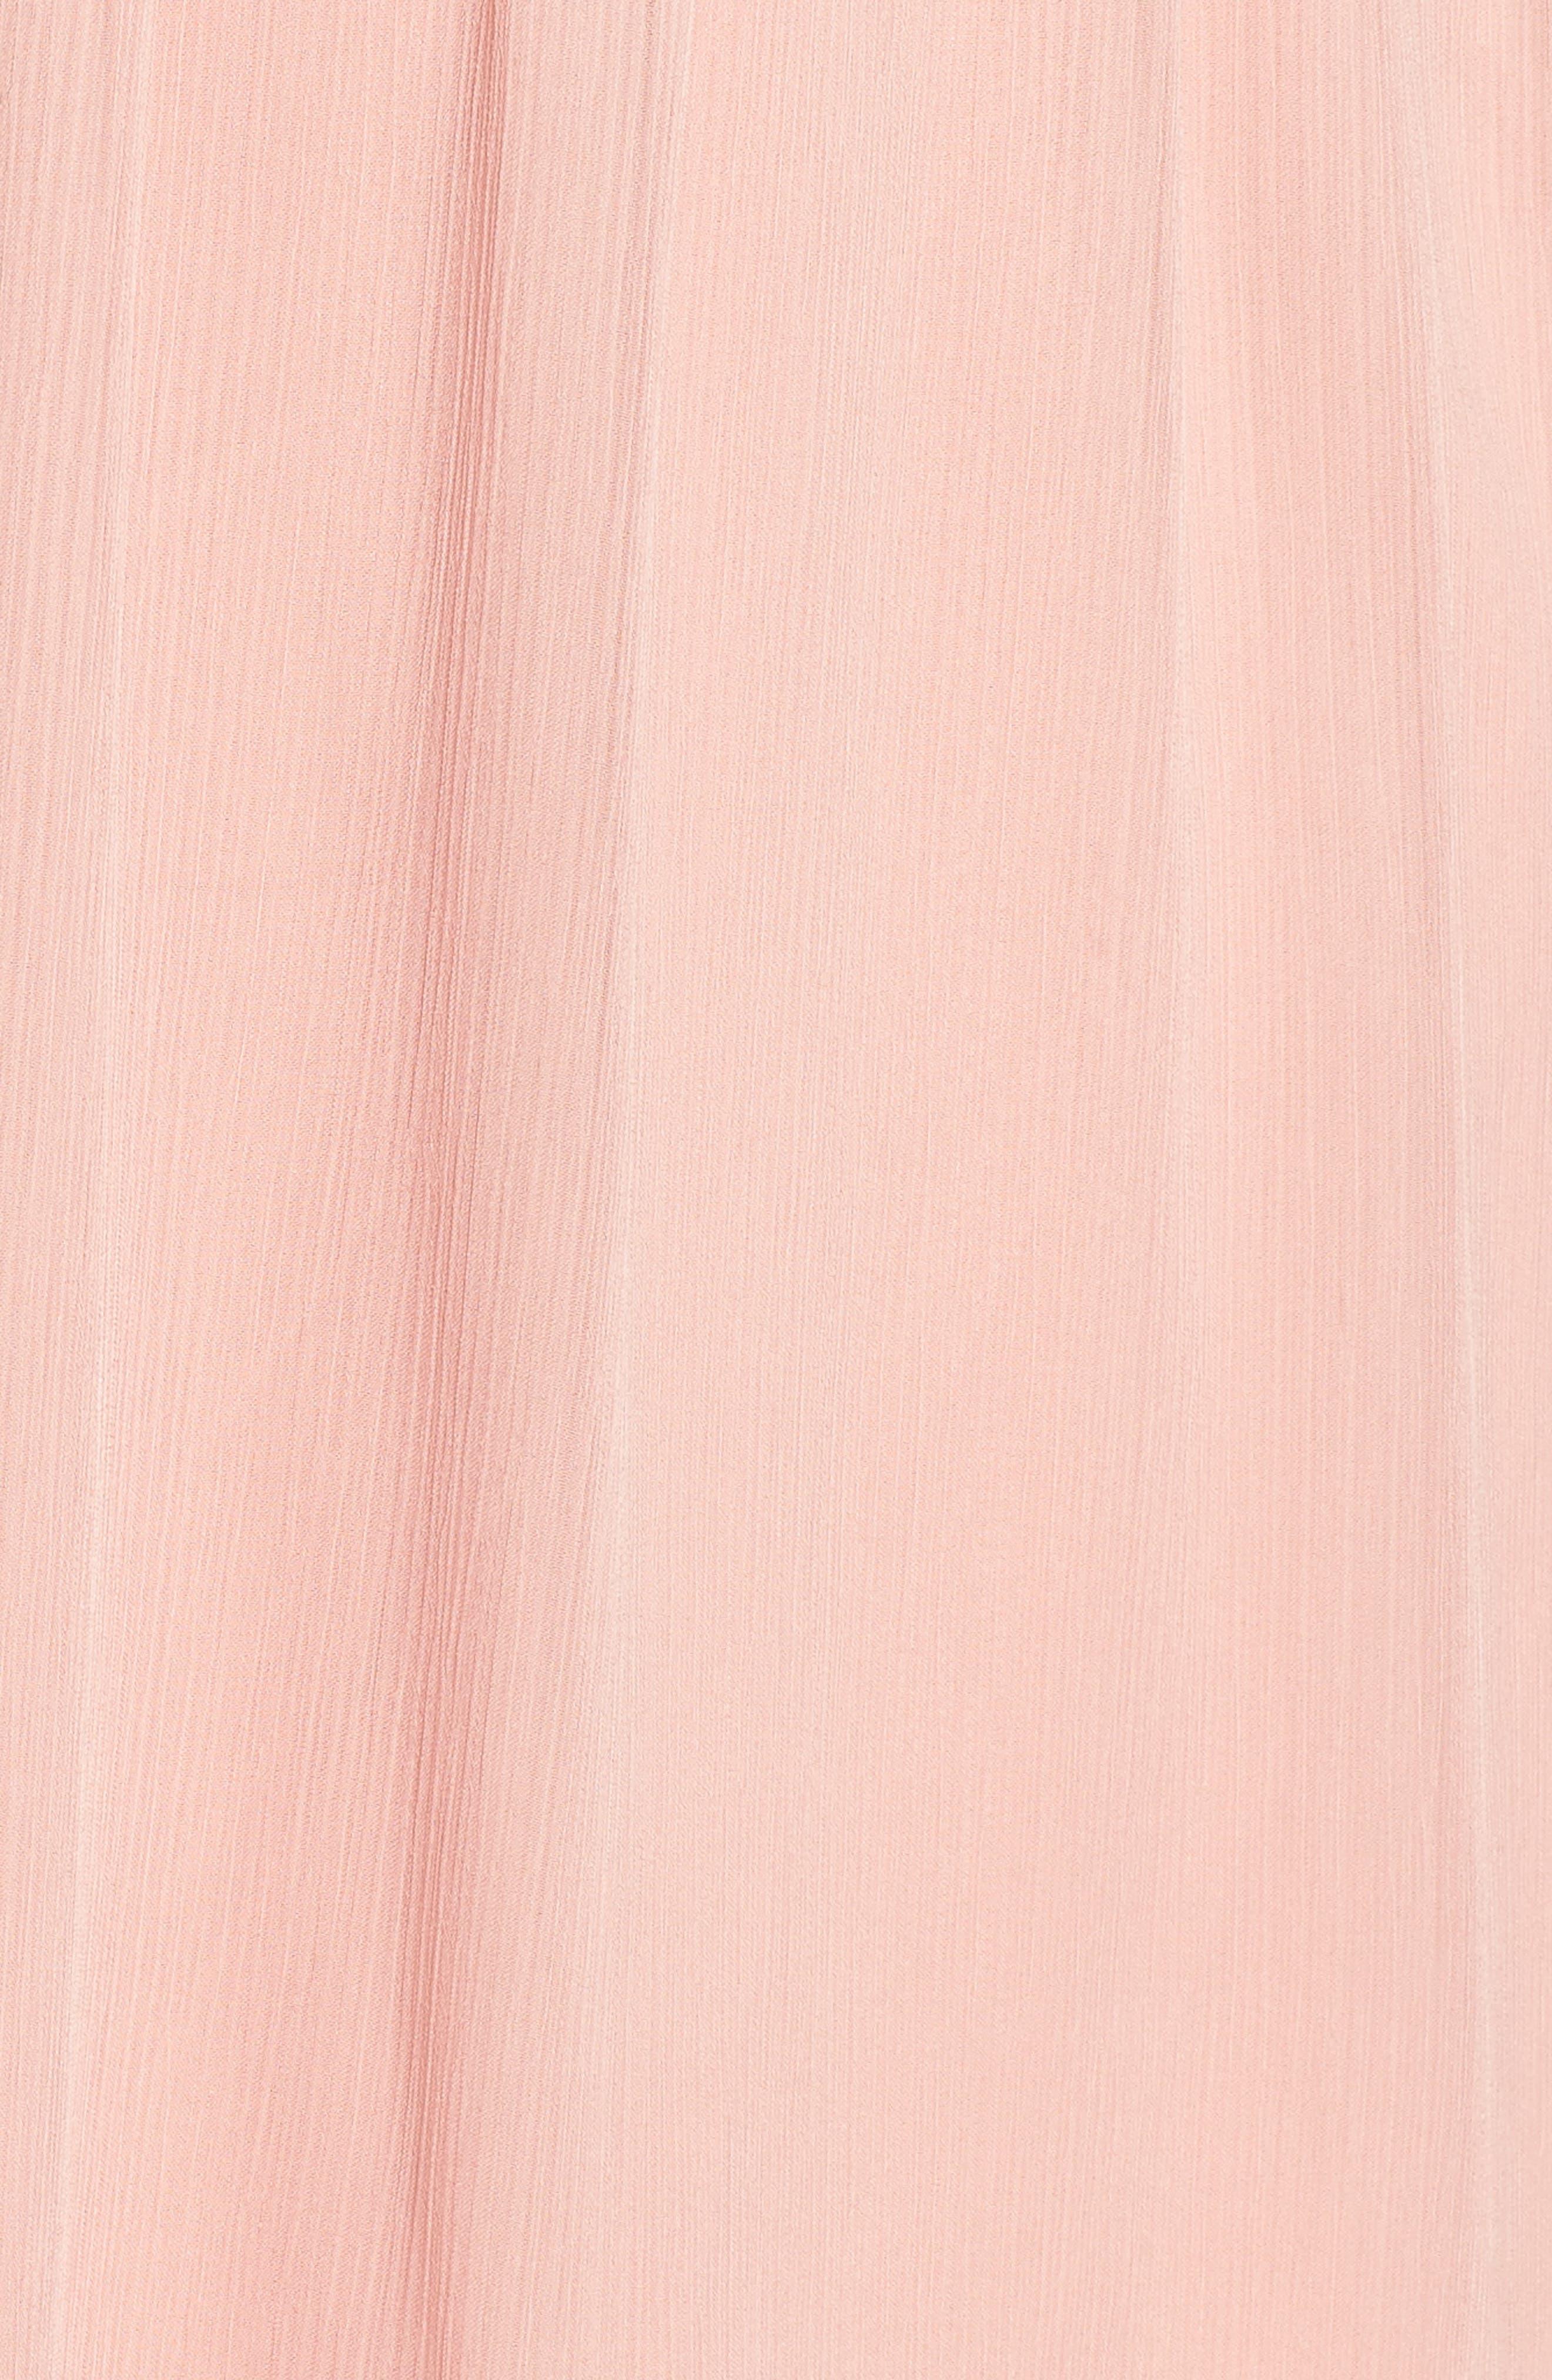 Satin Trim Crinkle Dress,                             Alternate thumbnail 5, color,                             650